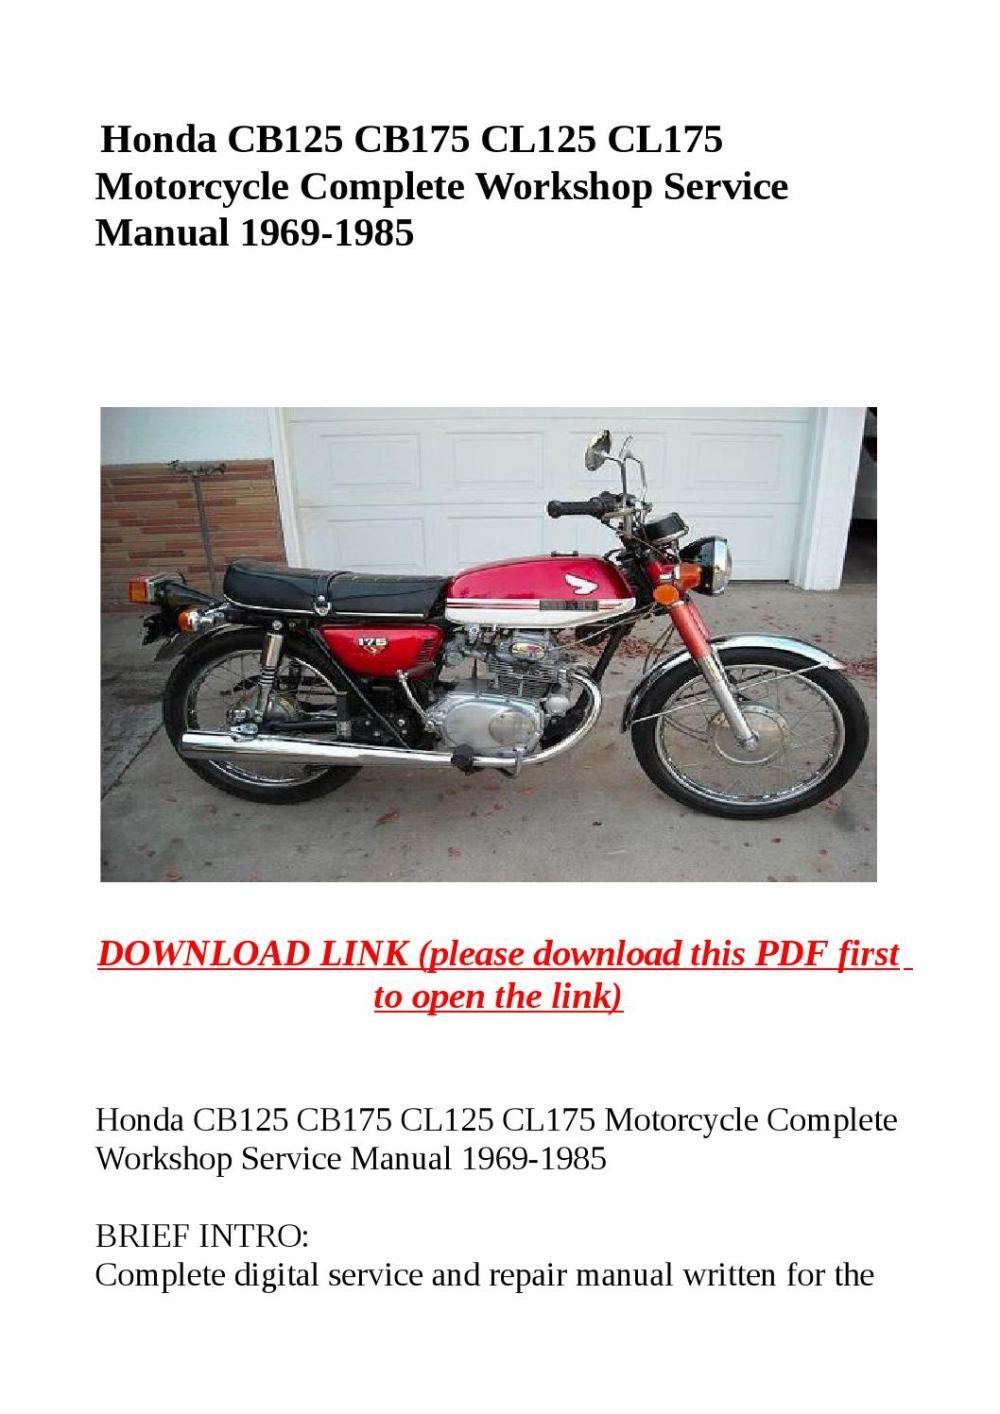 medium resolution of honda cb125 cb175 cl125 cl175 motorcycle complete workshop service manual 1969 1985